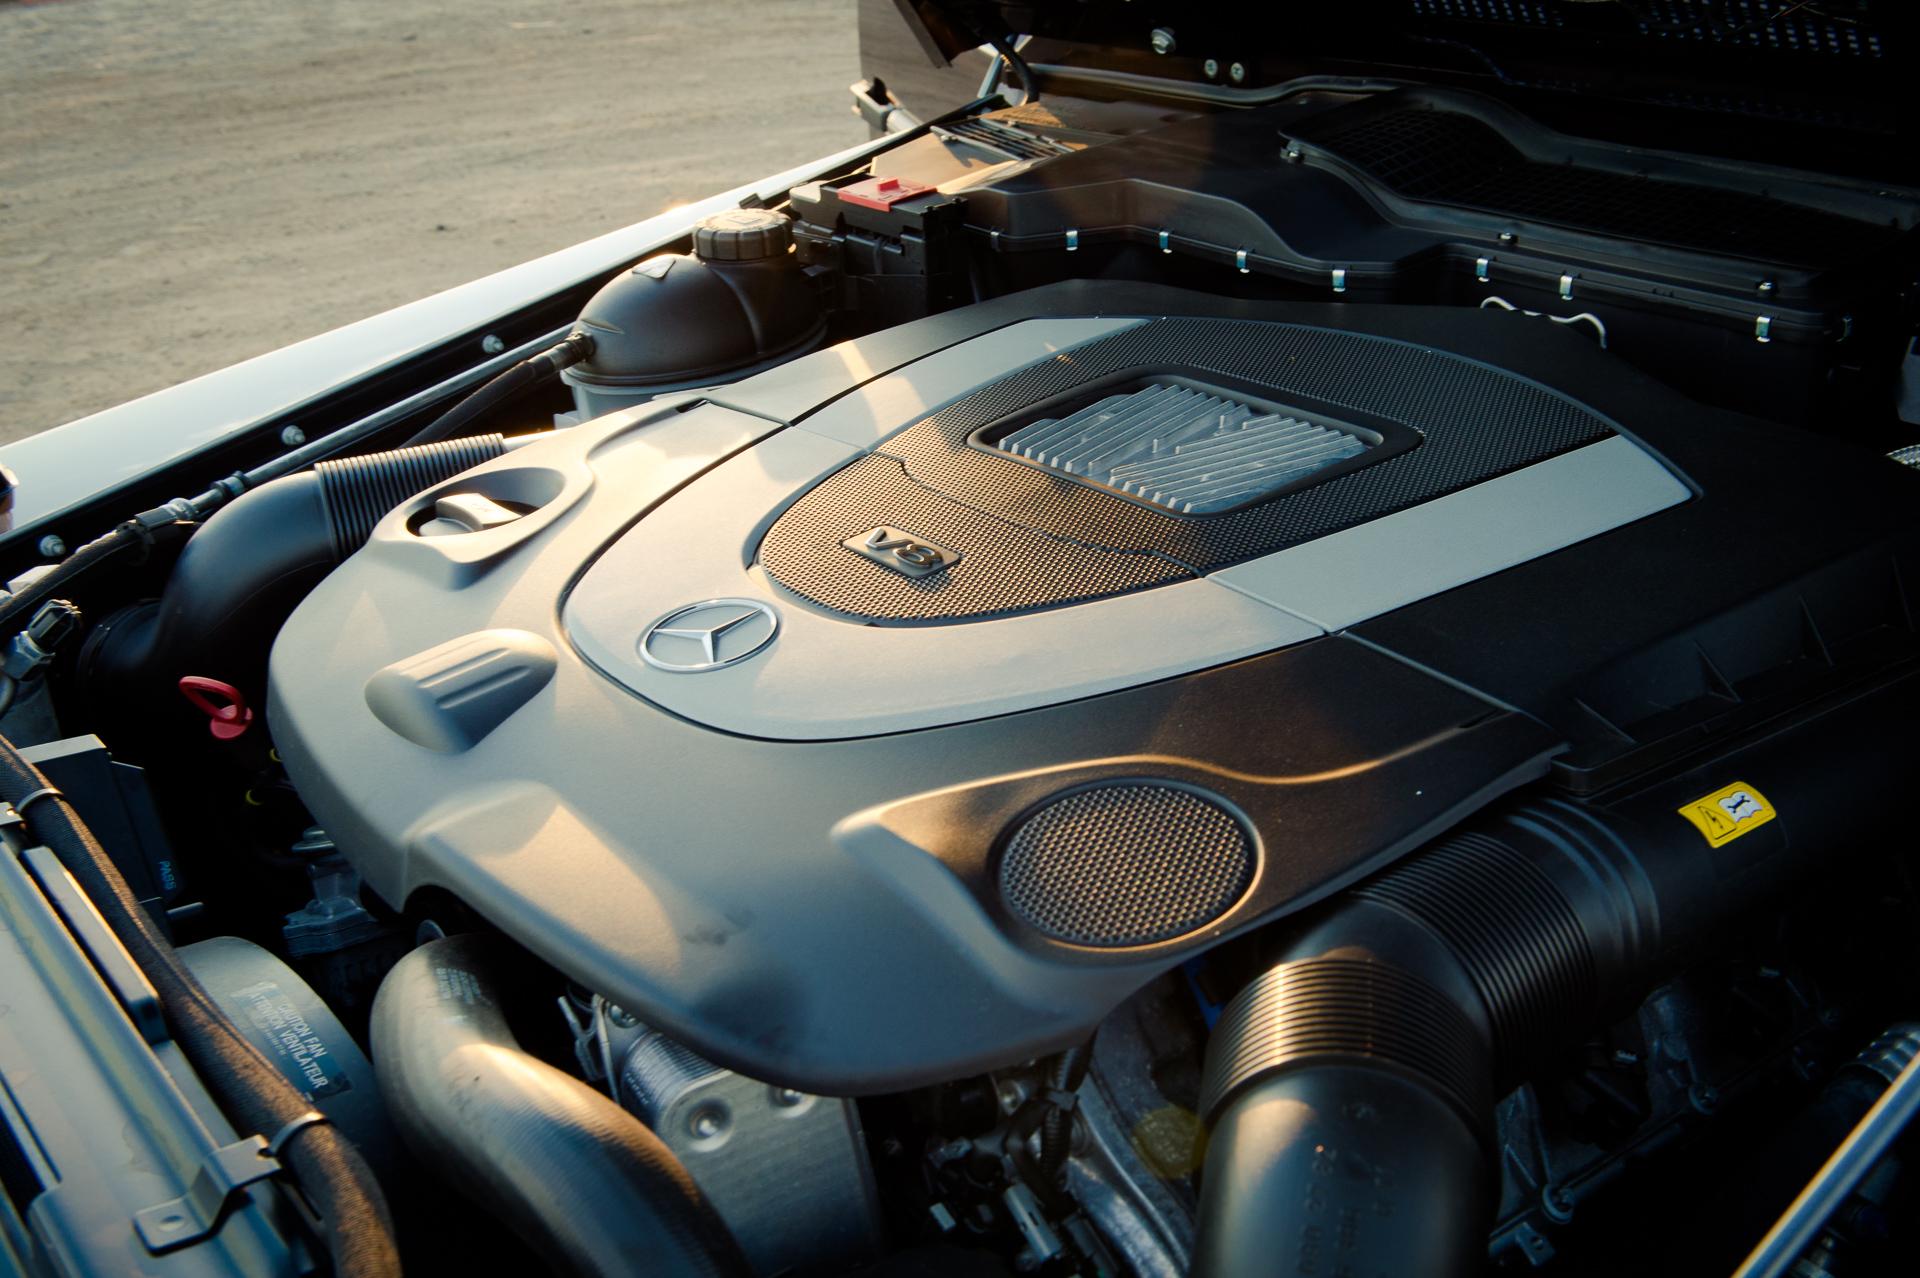 2014-Mercedes-Benz-G500-G550-braun-Kalifornien-mbrt14-51